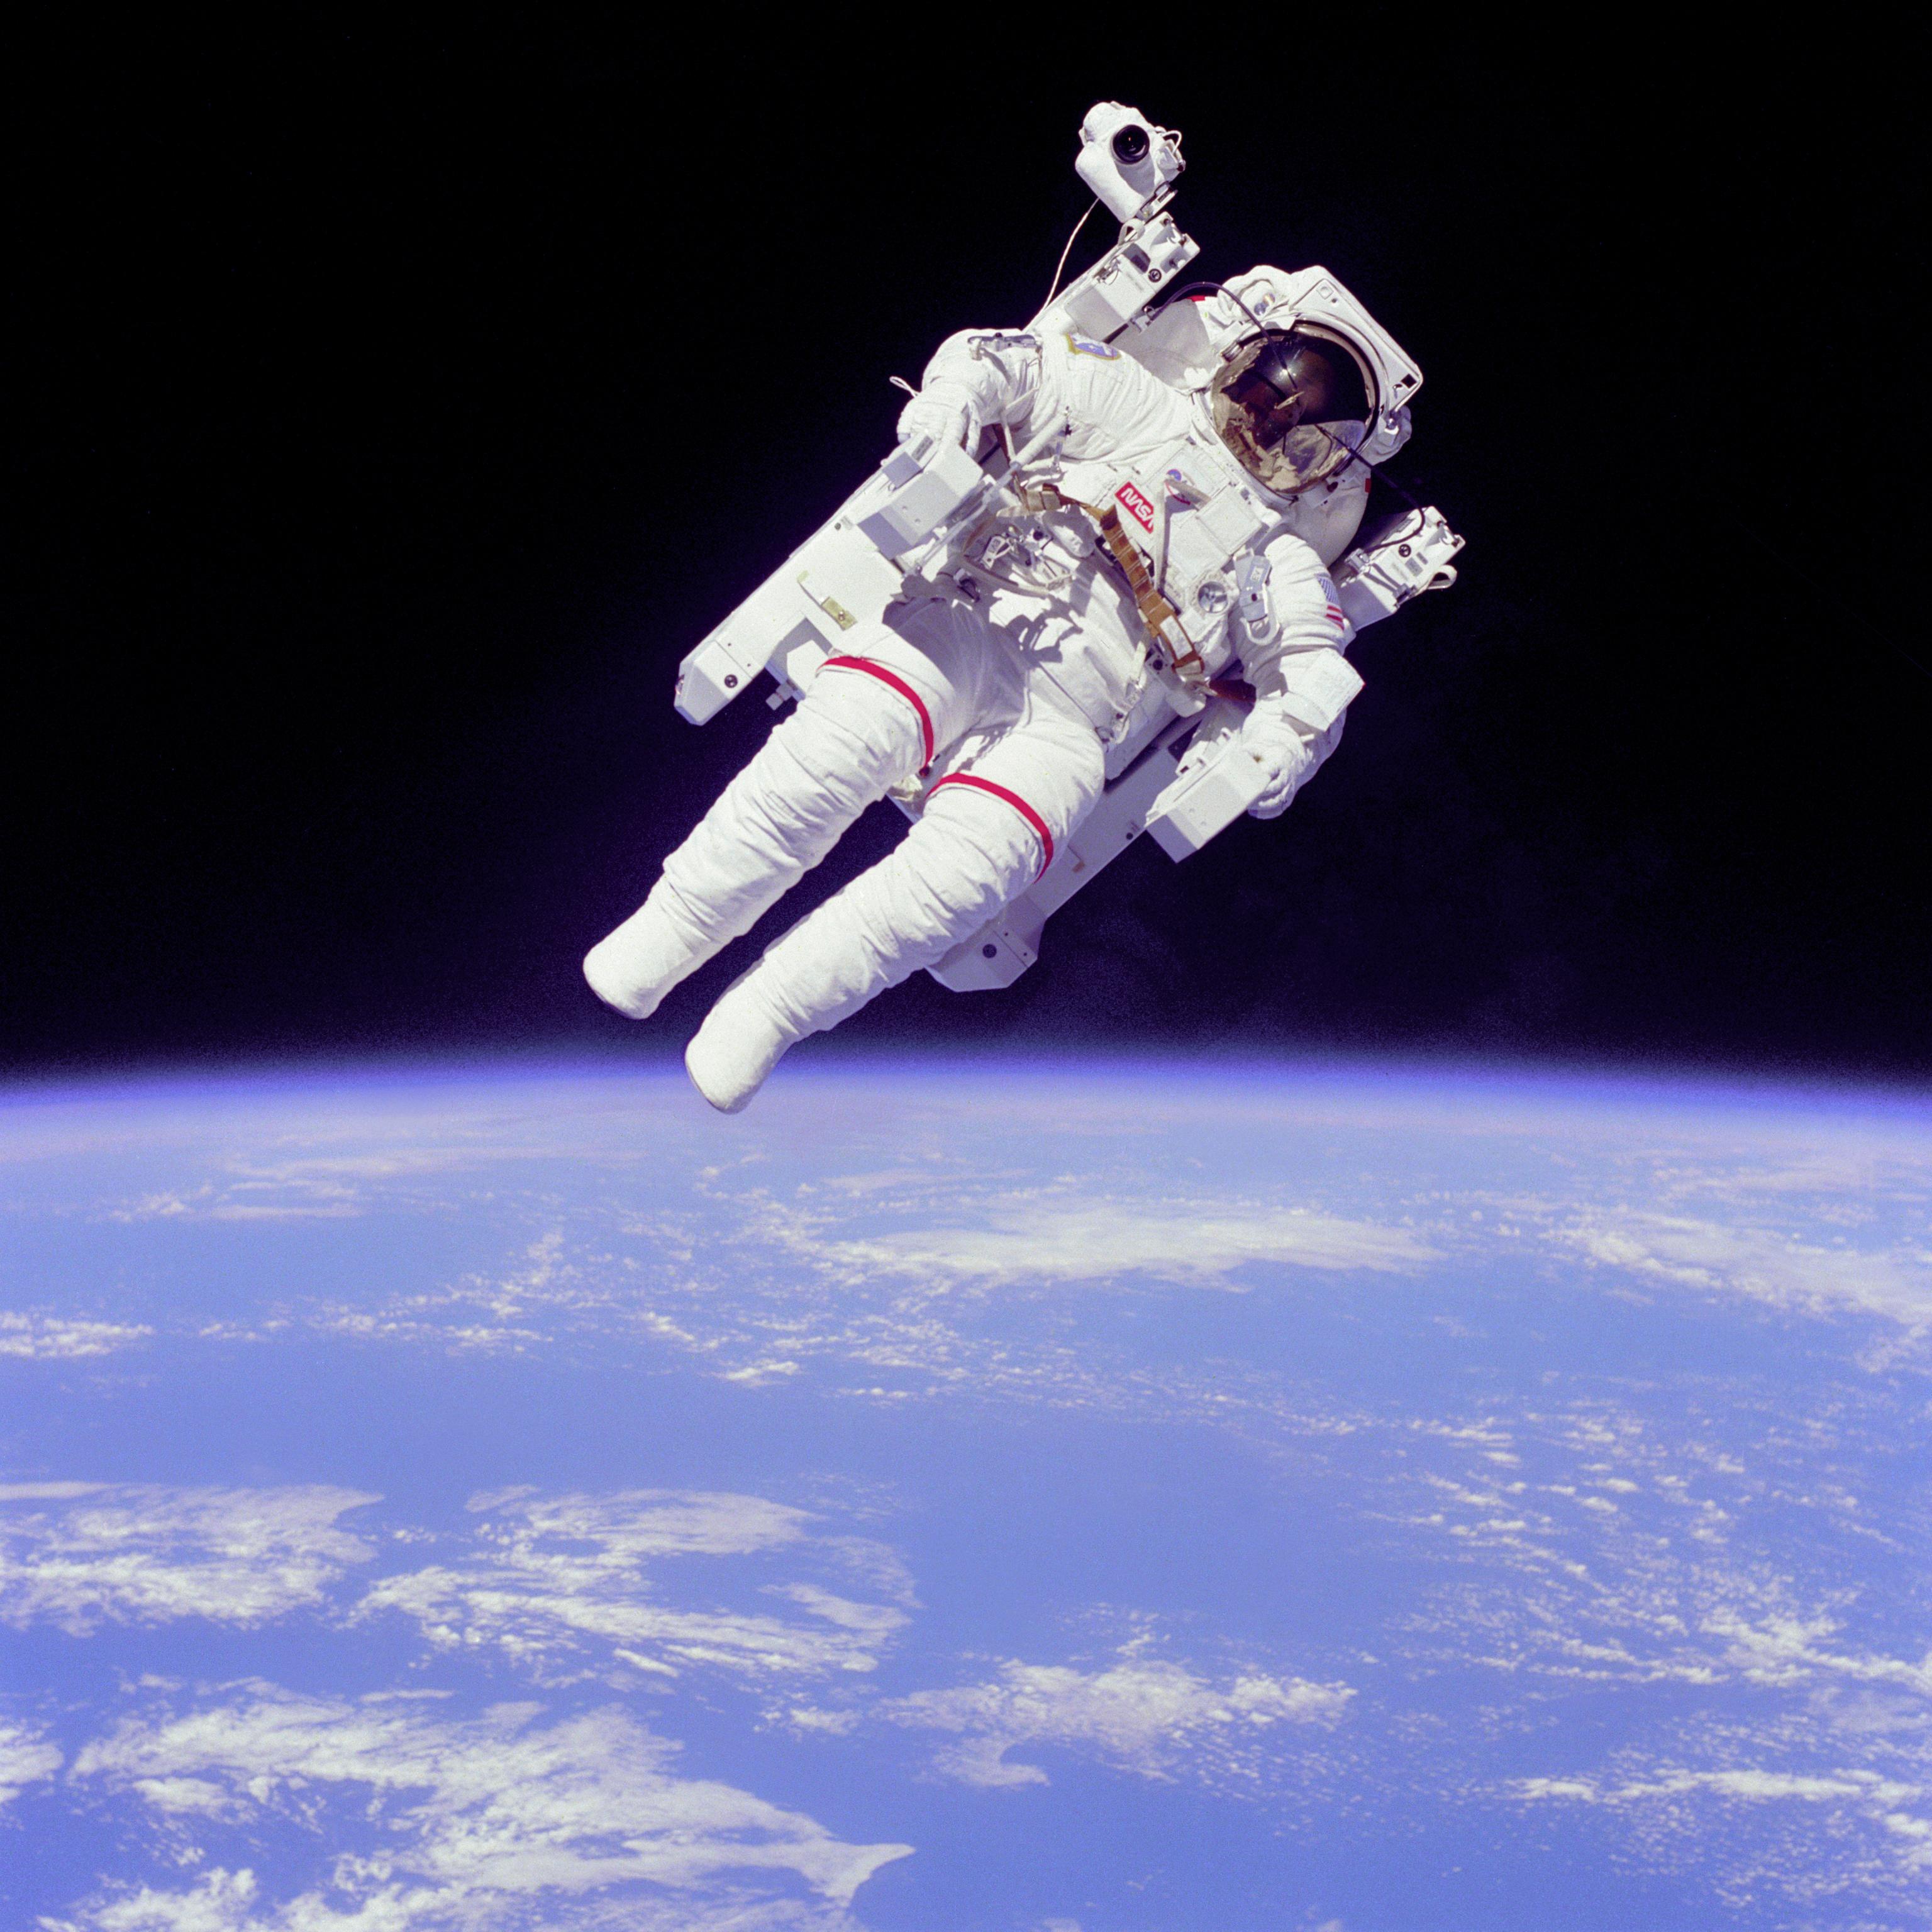 astronaut space shuttle - photo #46